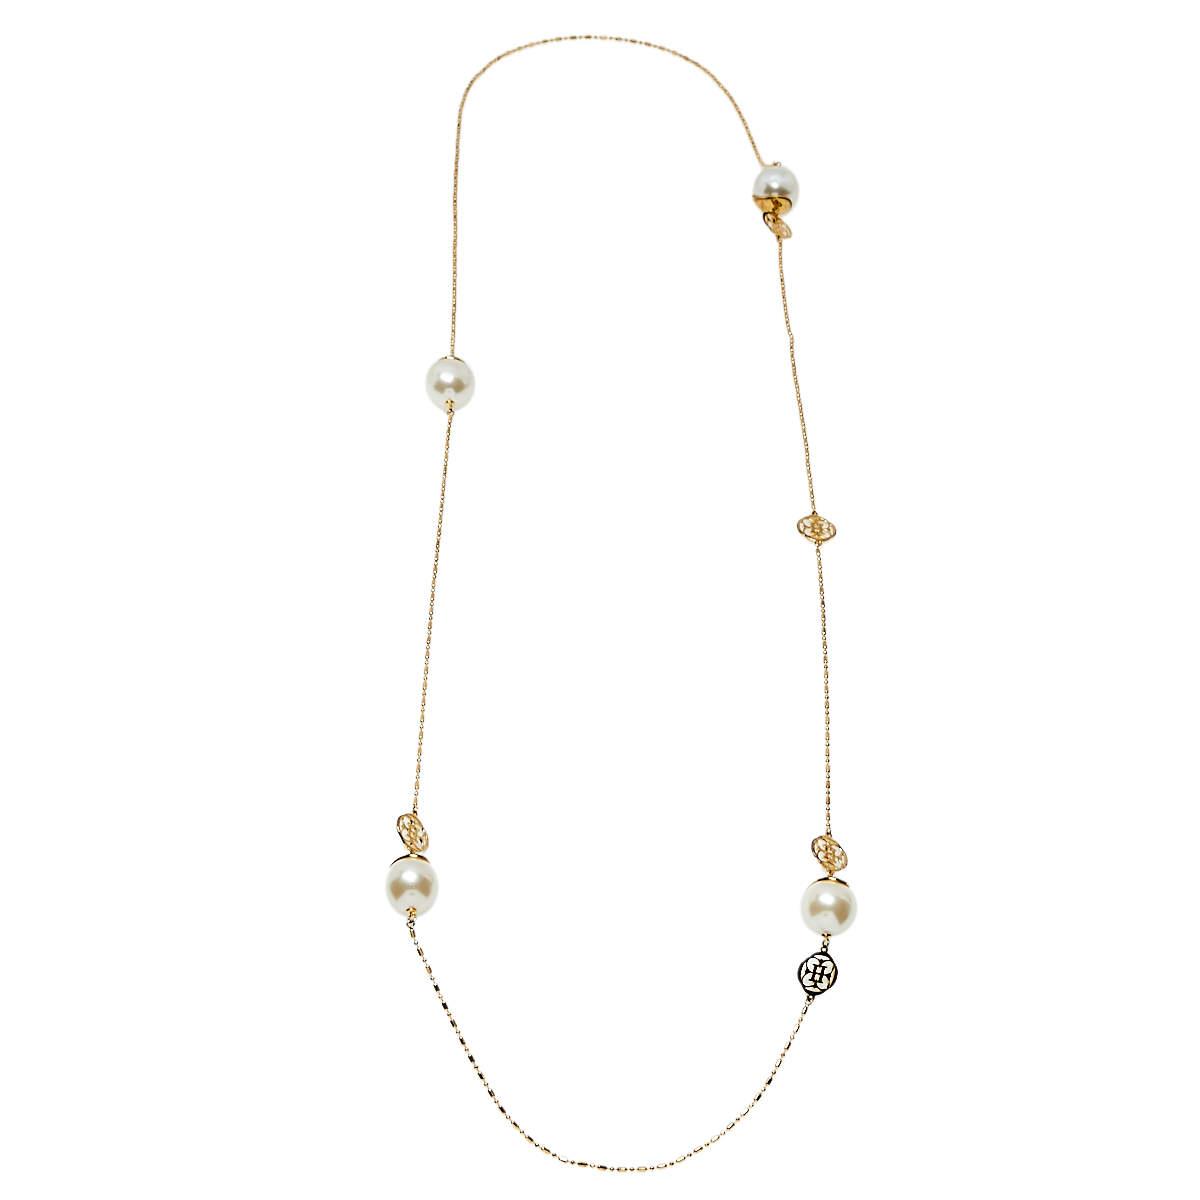 Carolina Herrera Gold Tone Faux Pearl Station Long Necklace